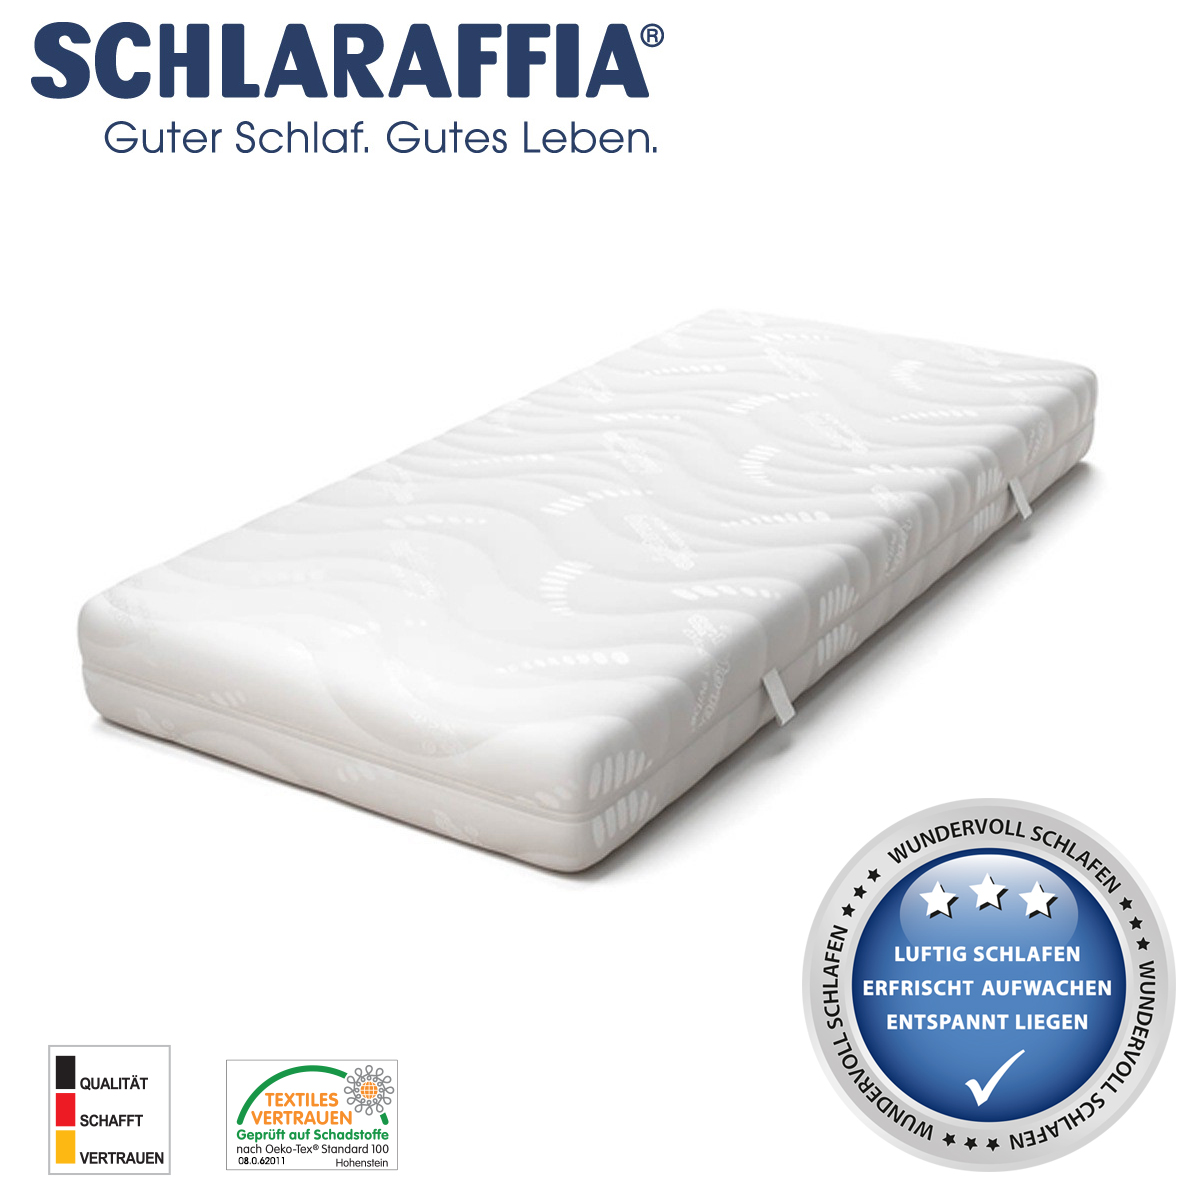 schlaraffia sky 200 bultex matratze 80x200 cm h3. Black Bedroom Furniture Sets. Home Design Ideas